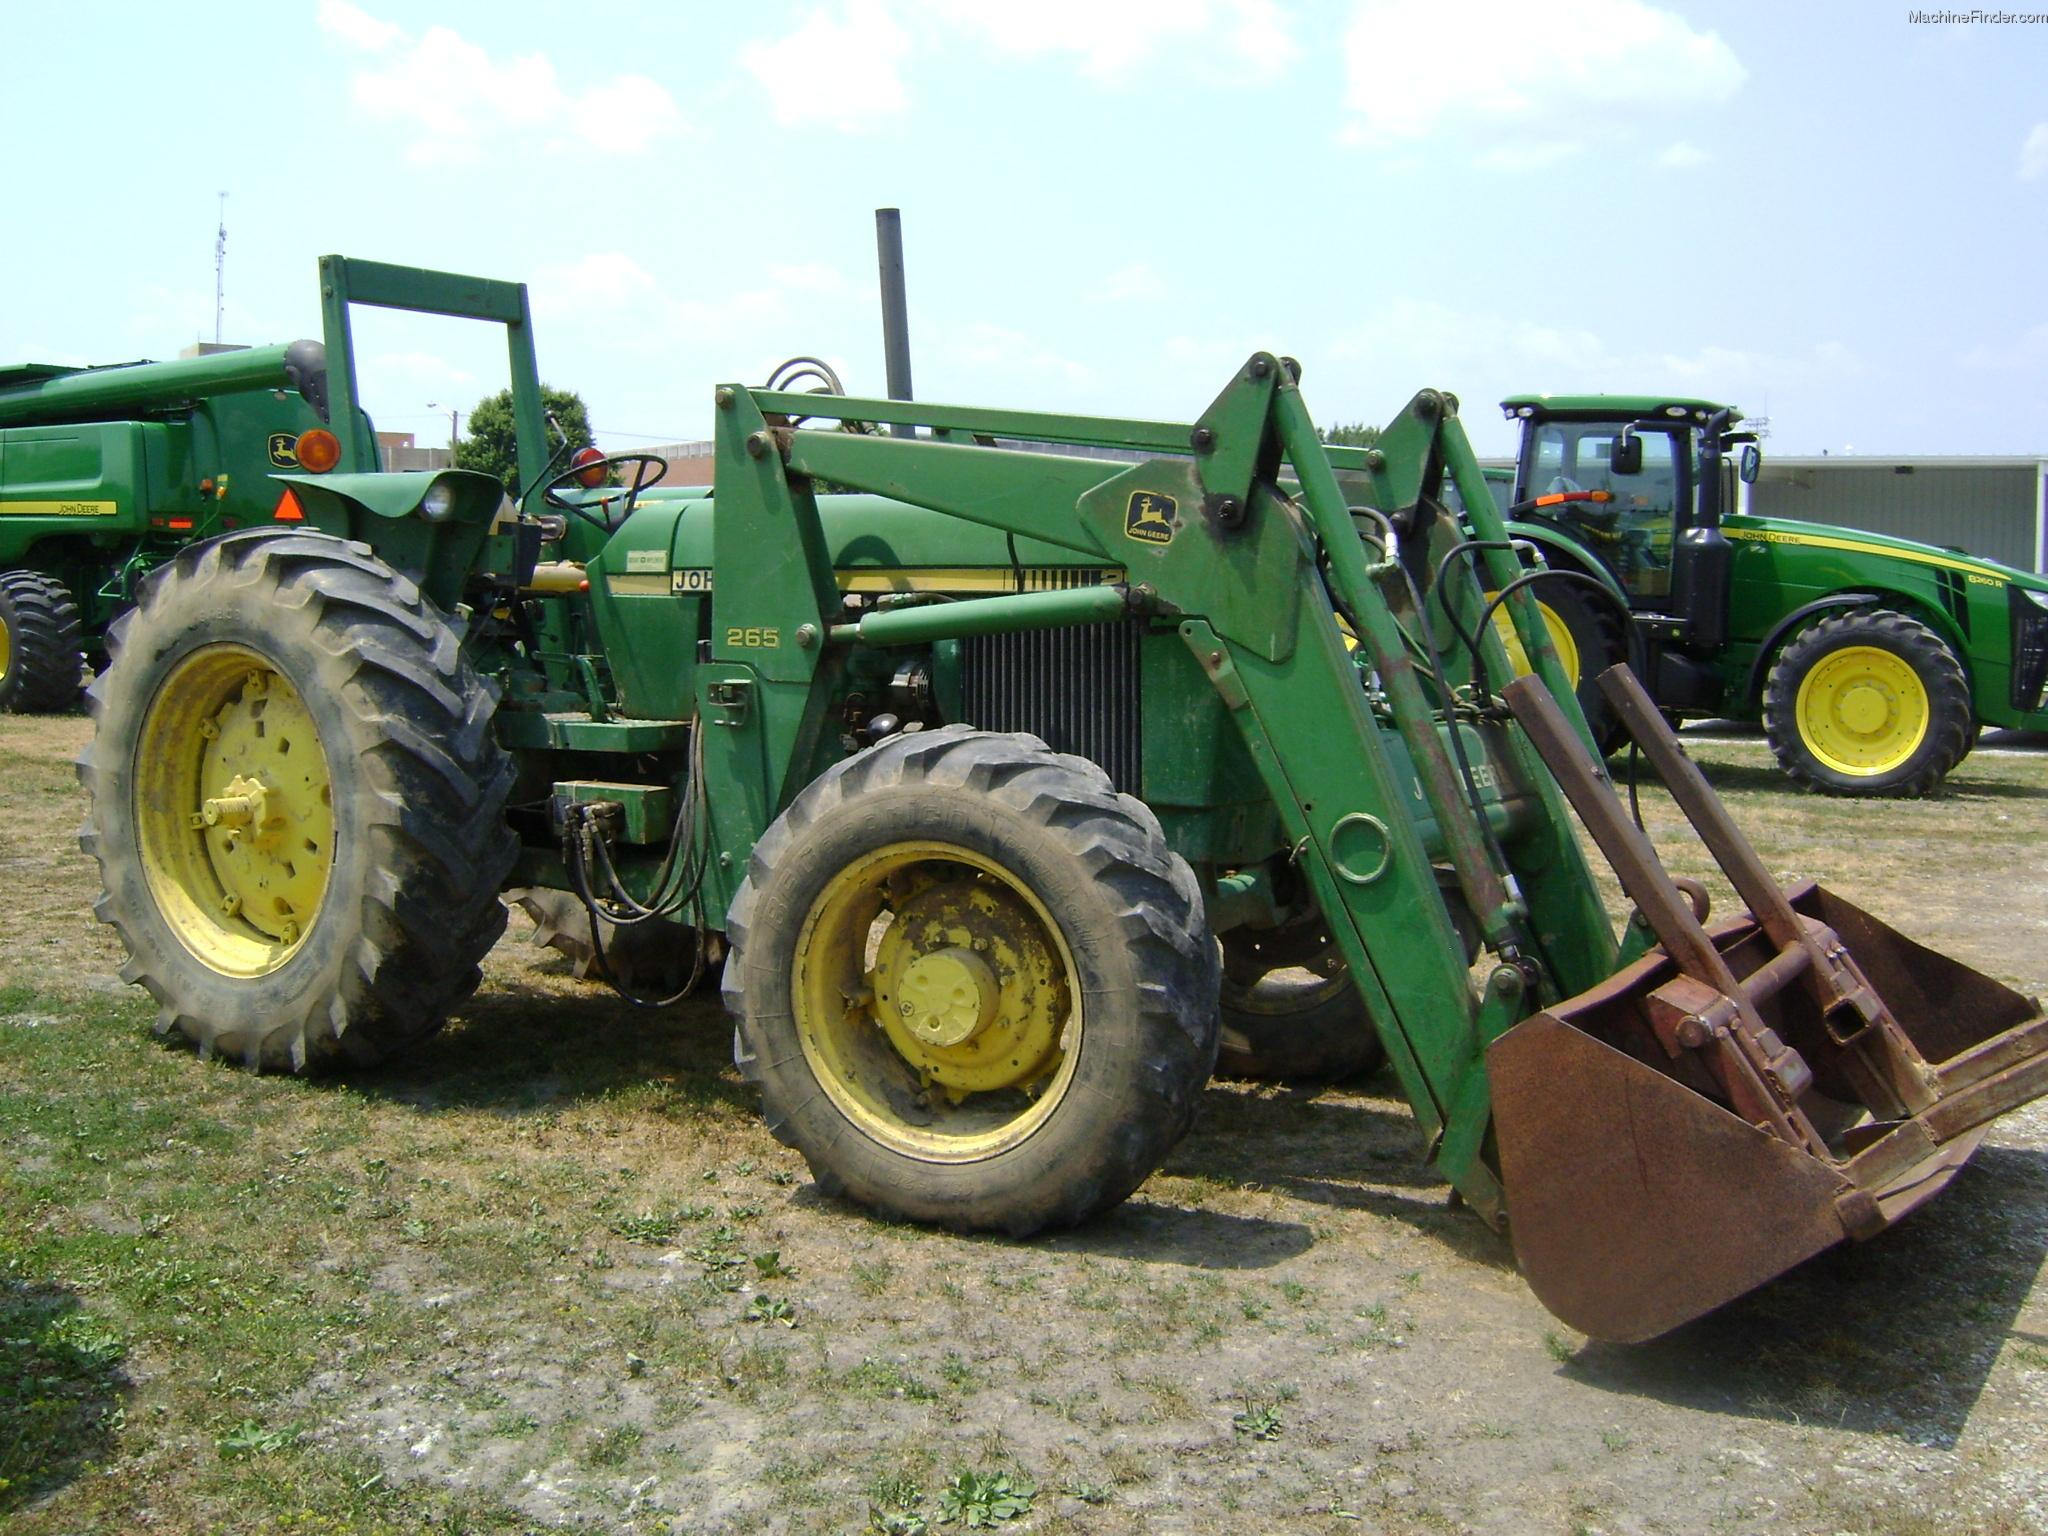 1986 John Deere 2950 Tractors - Utility (40-100hp) - John ...